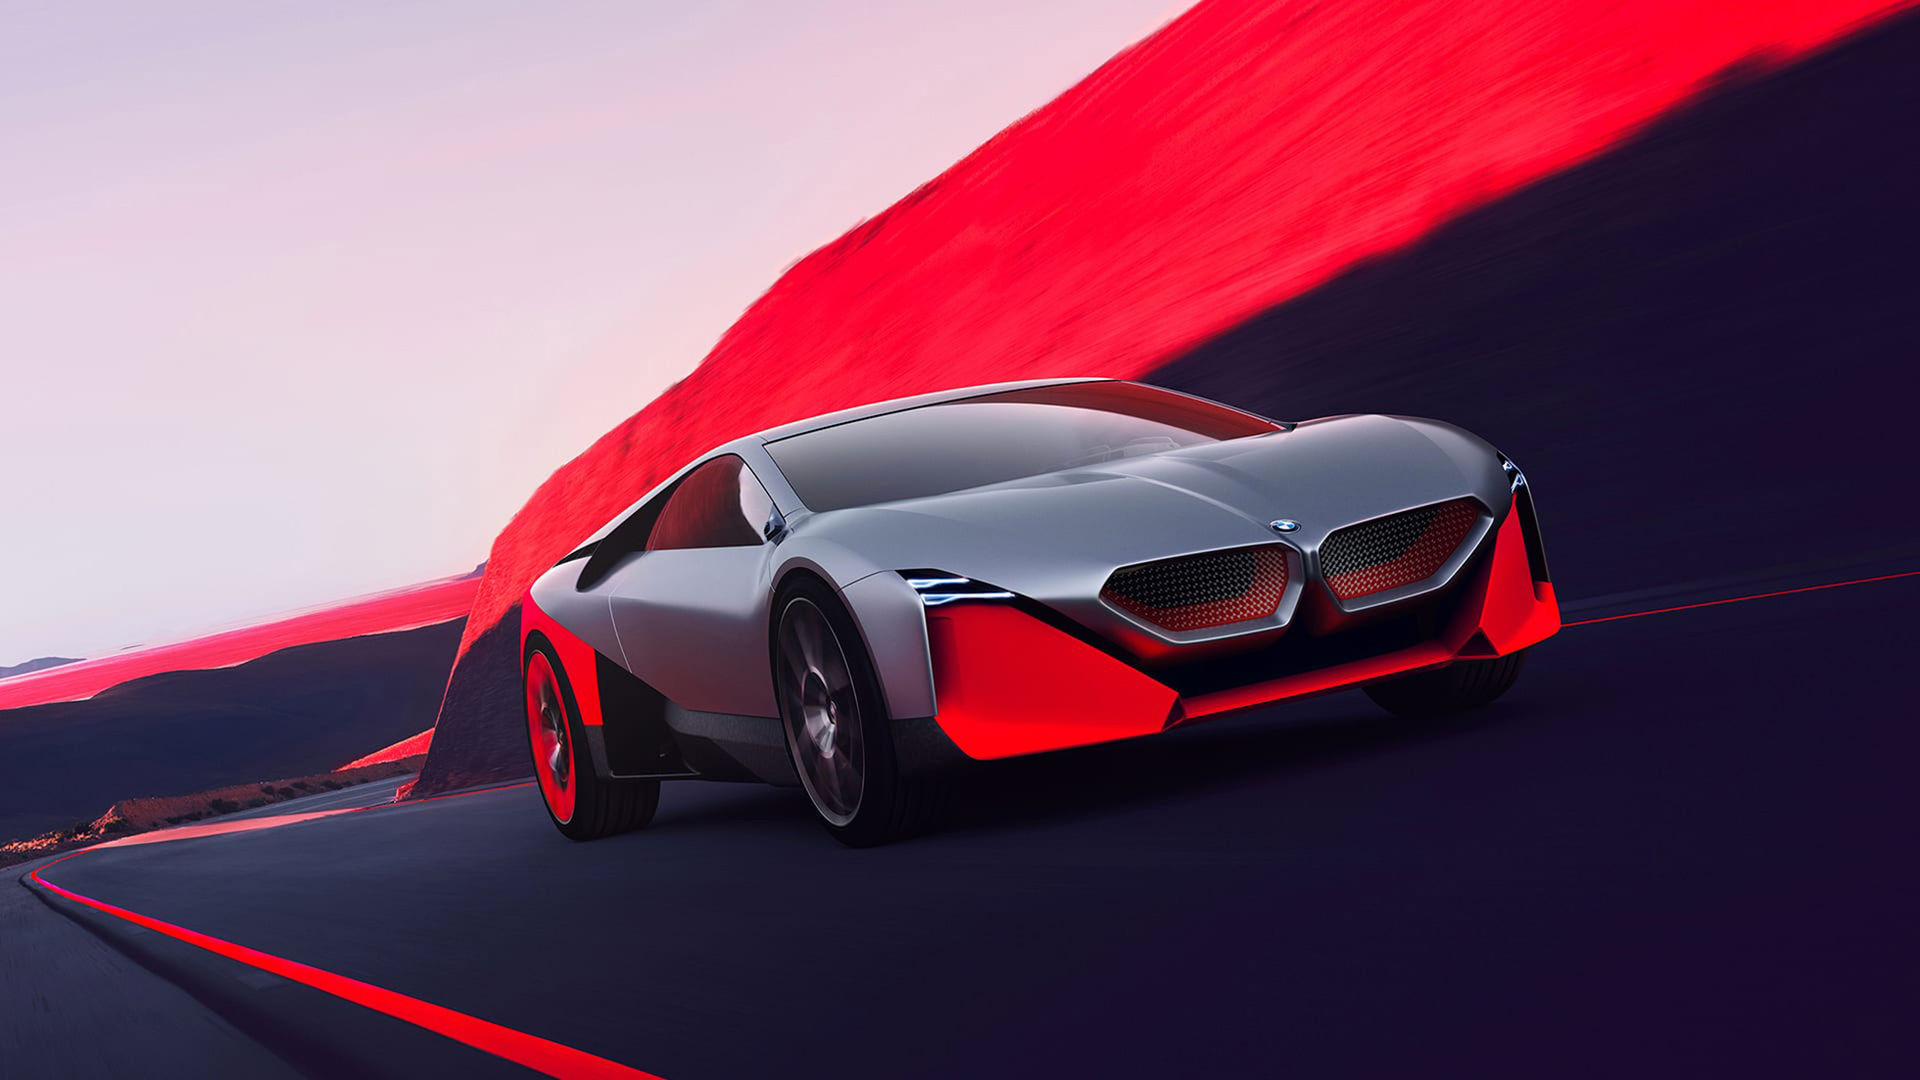 Uppföljaren till BMW i8 kanske heter i12